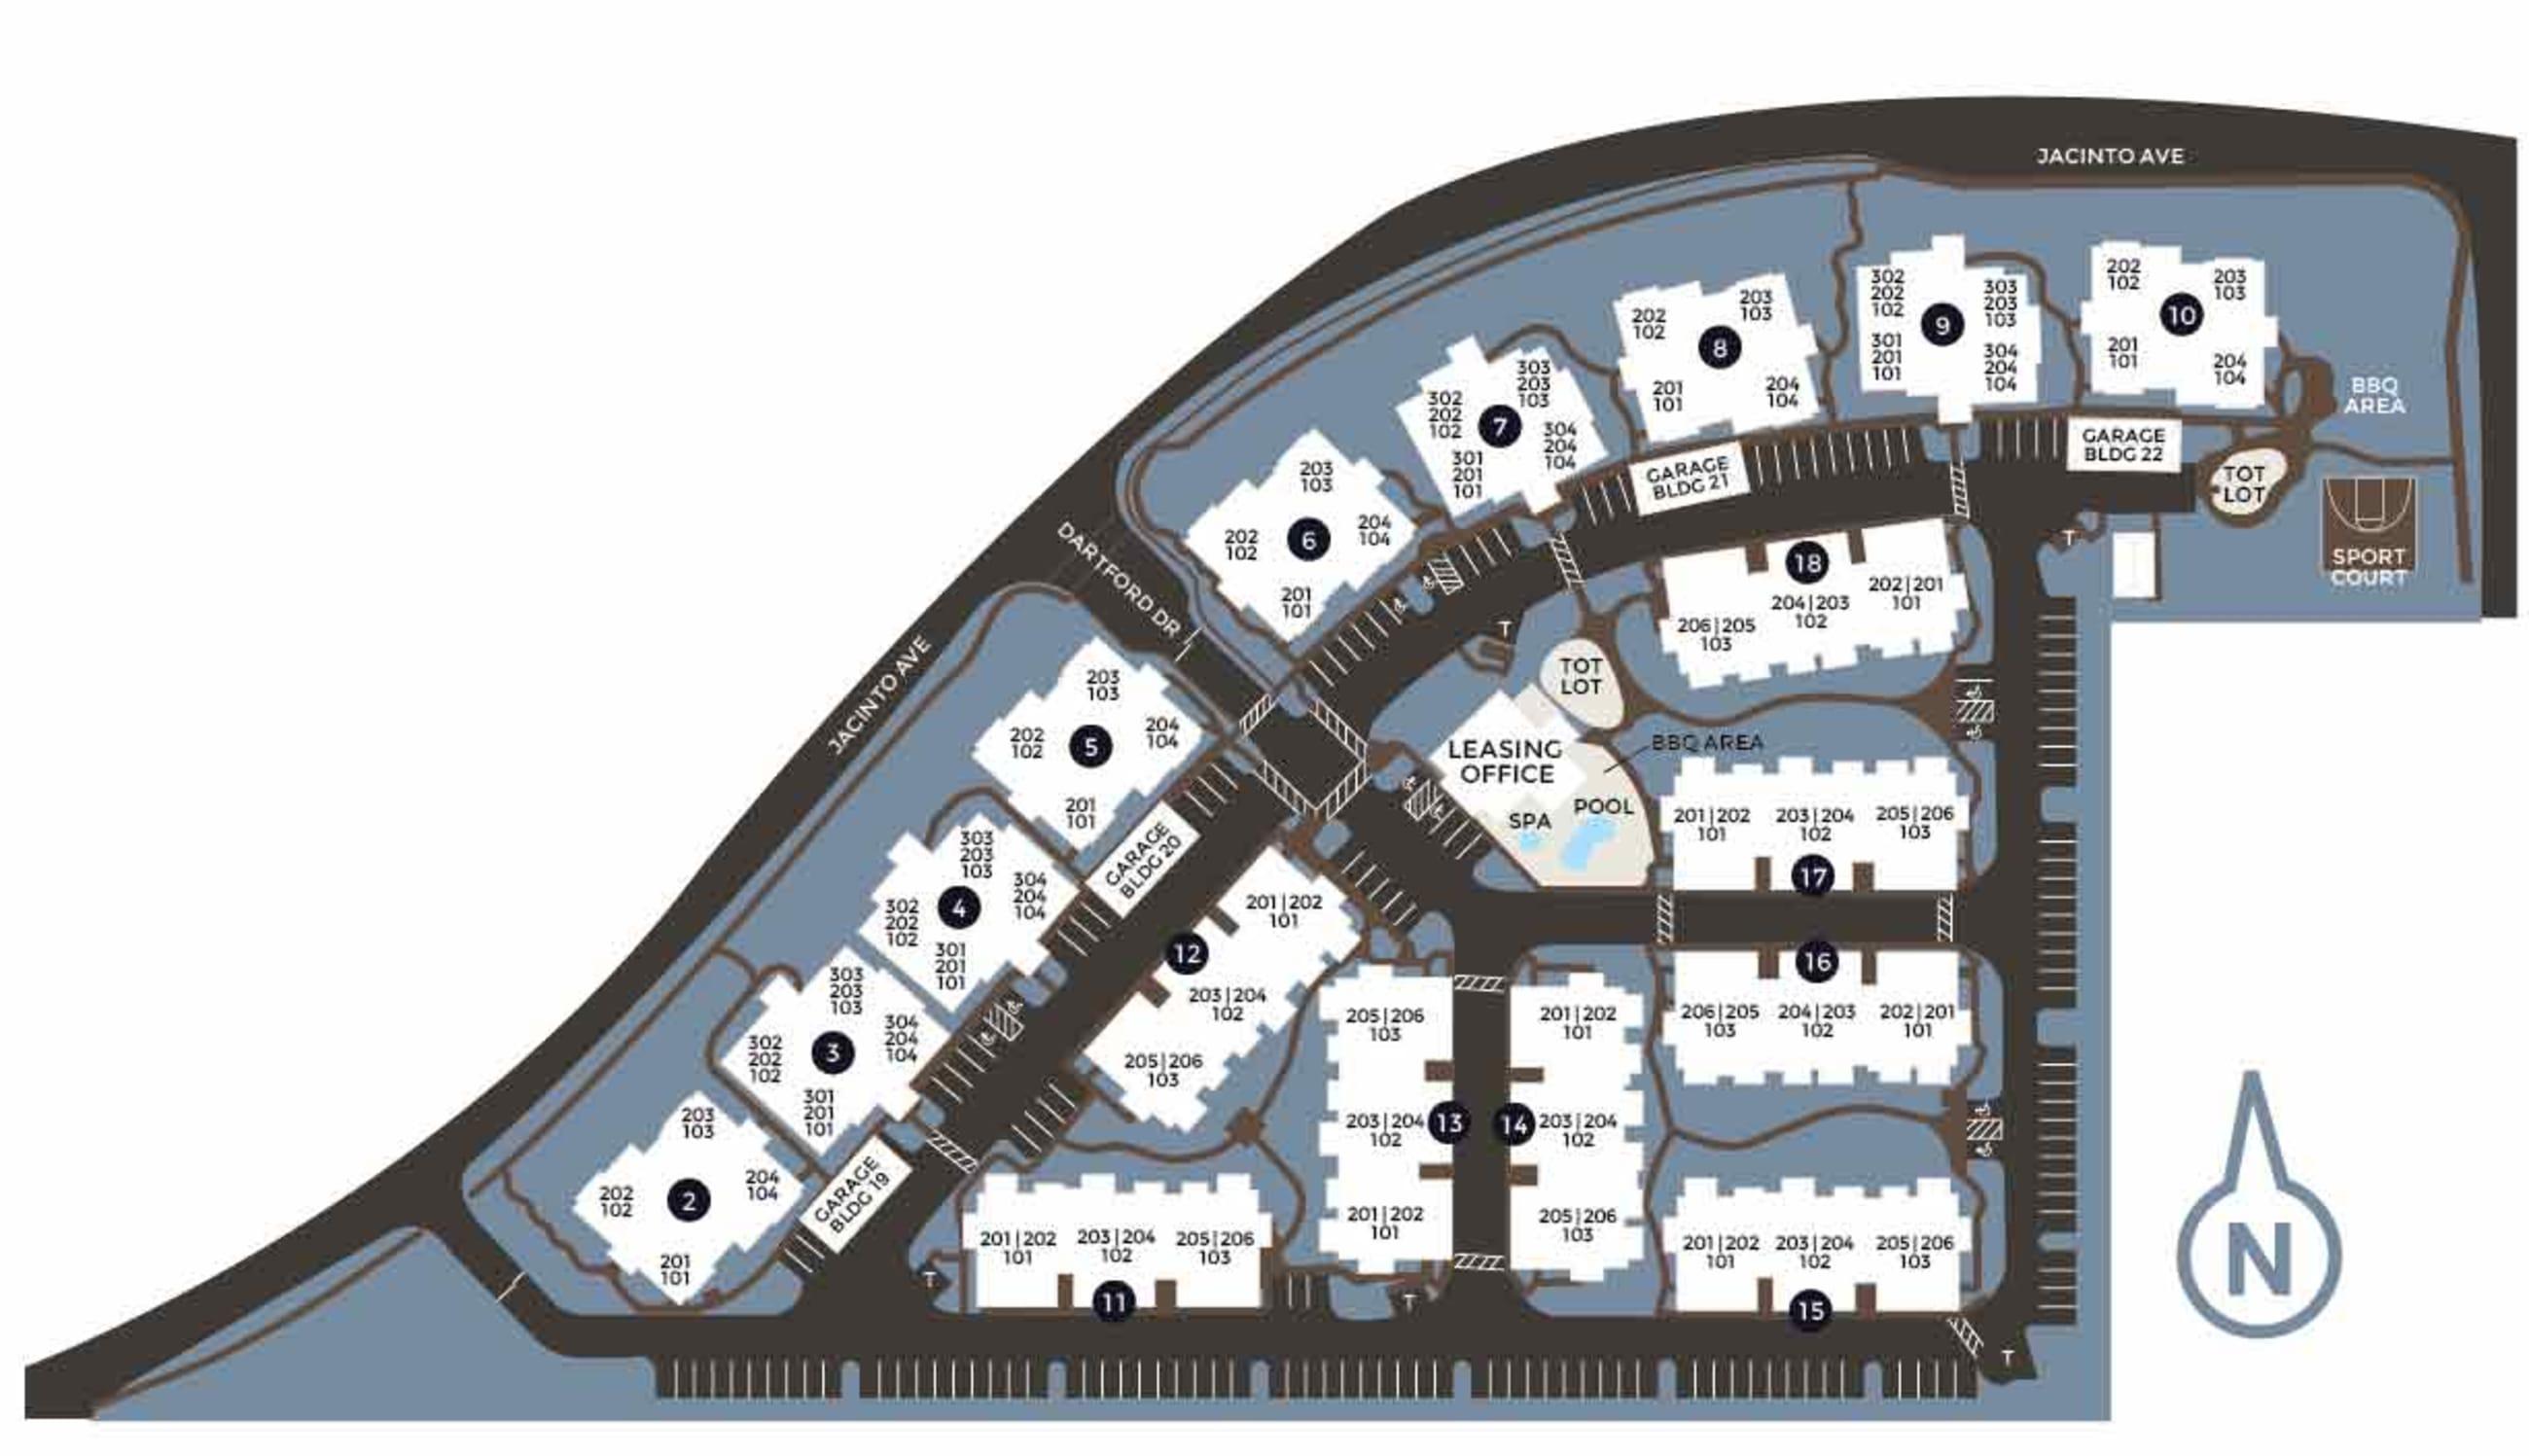 Community site map for Wolf Ranch Condominium Rentals in Sacramento, California